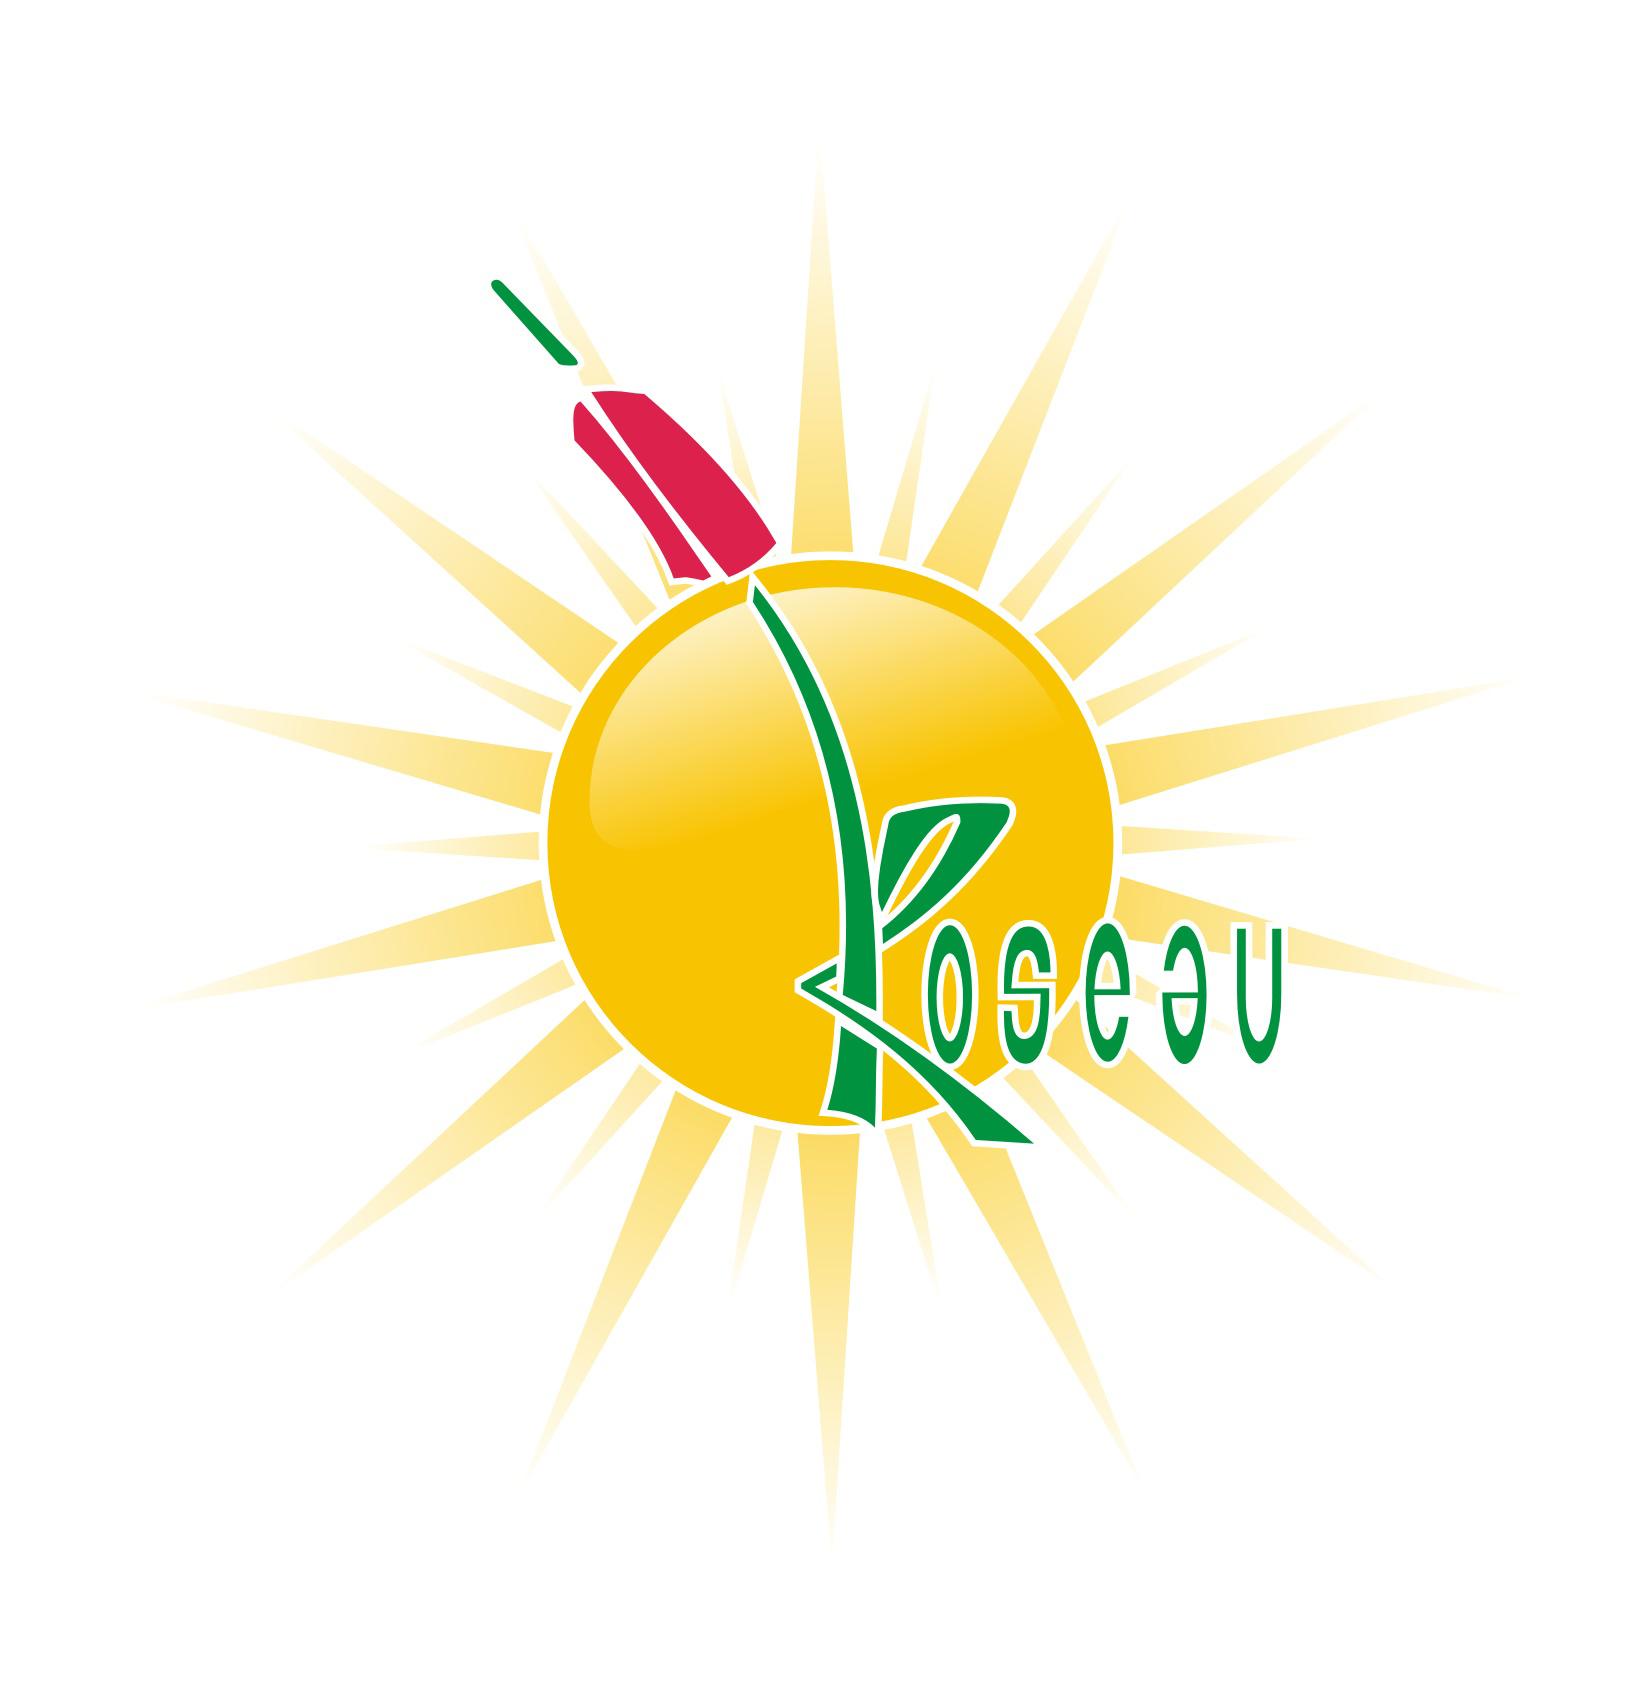 LOGO-ROSEAU-SOLEIL-SITE-INTERNET-NOV-07